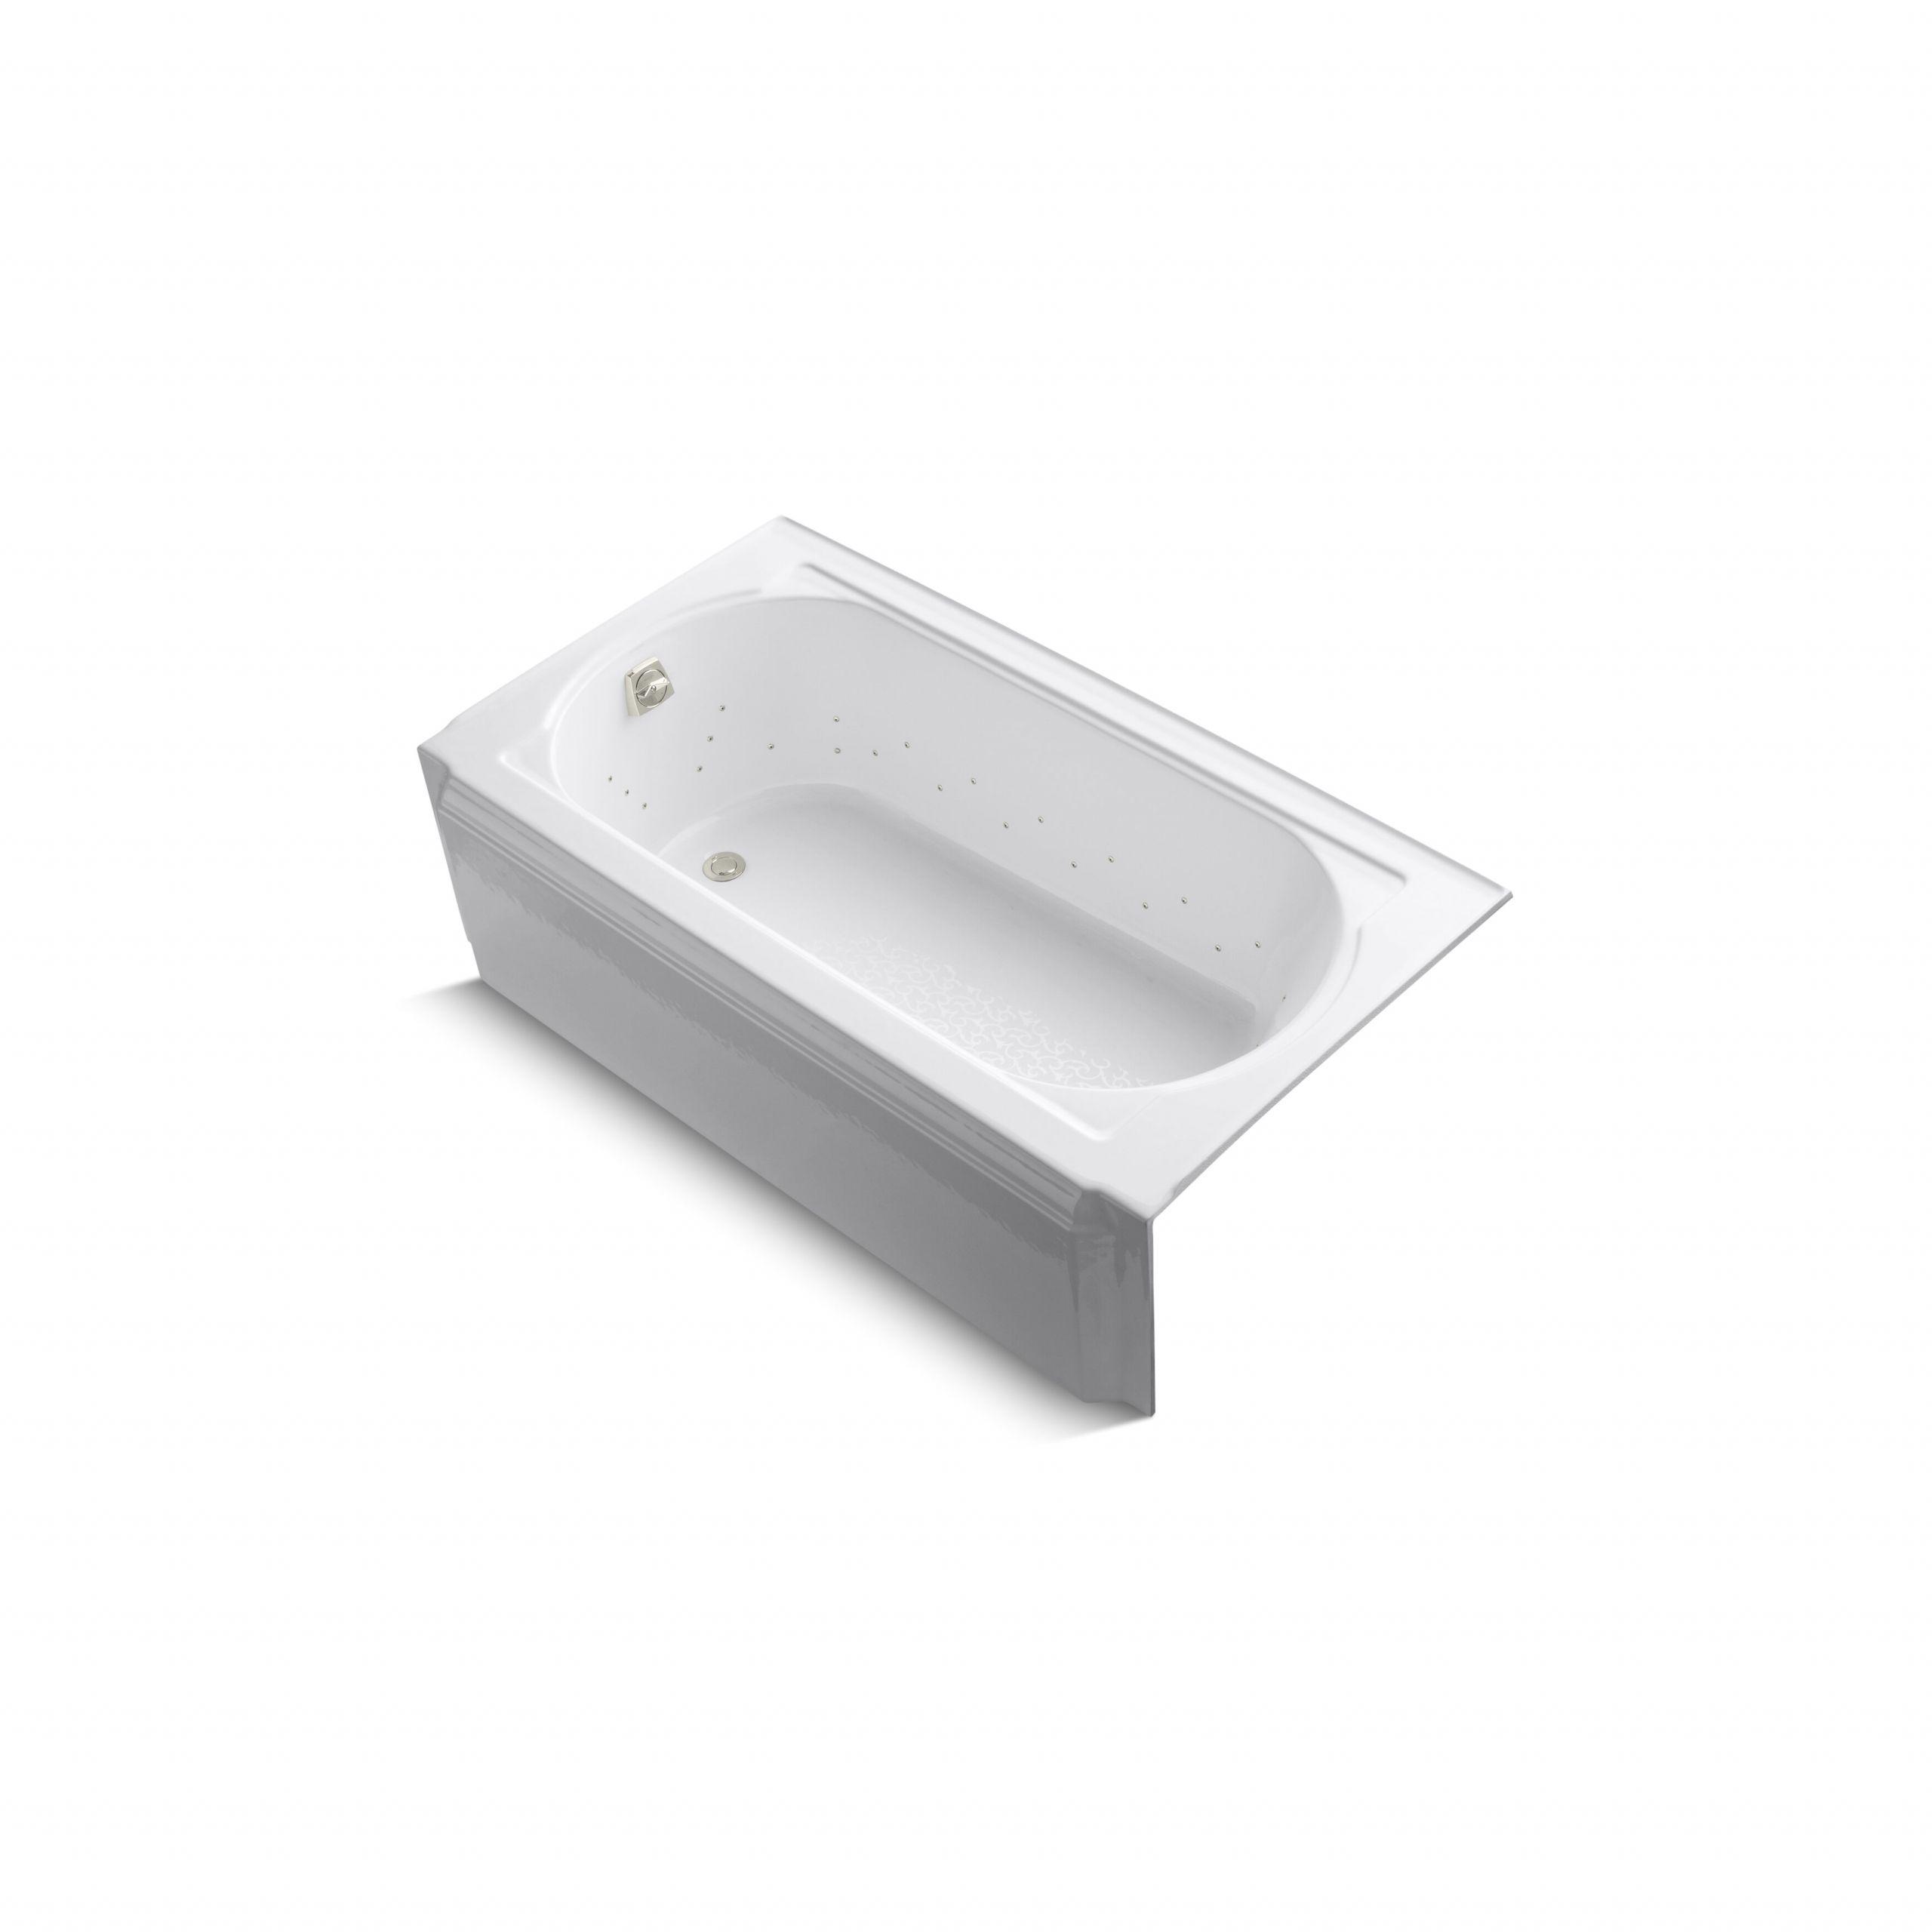 Kohler Memoirs 60 X 34 Alcove Bubblemassage Air Bath with Left Hand Drain 723 G KOH